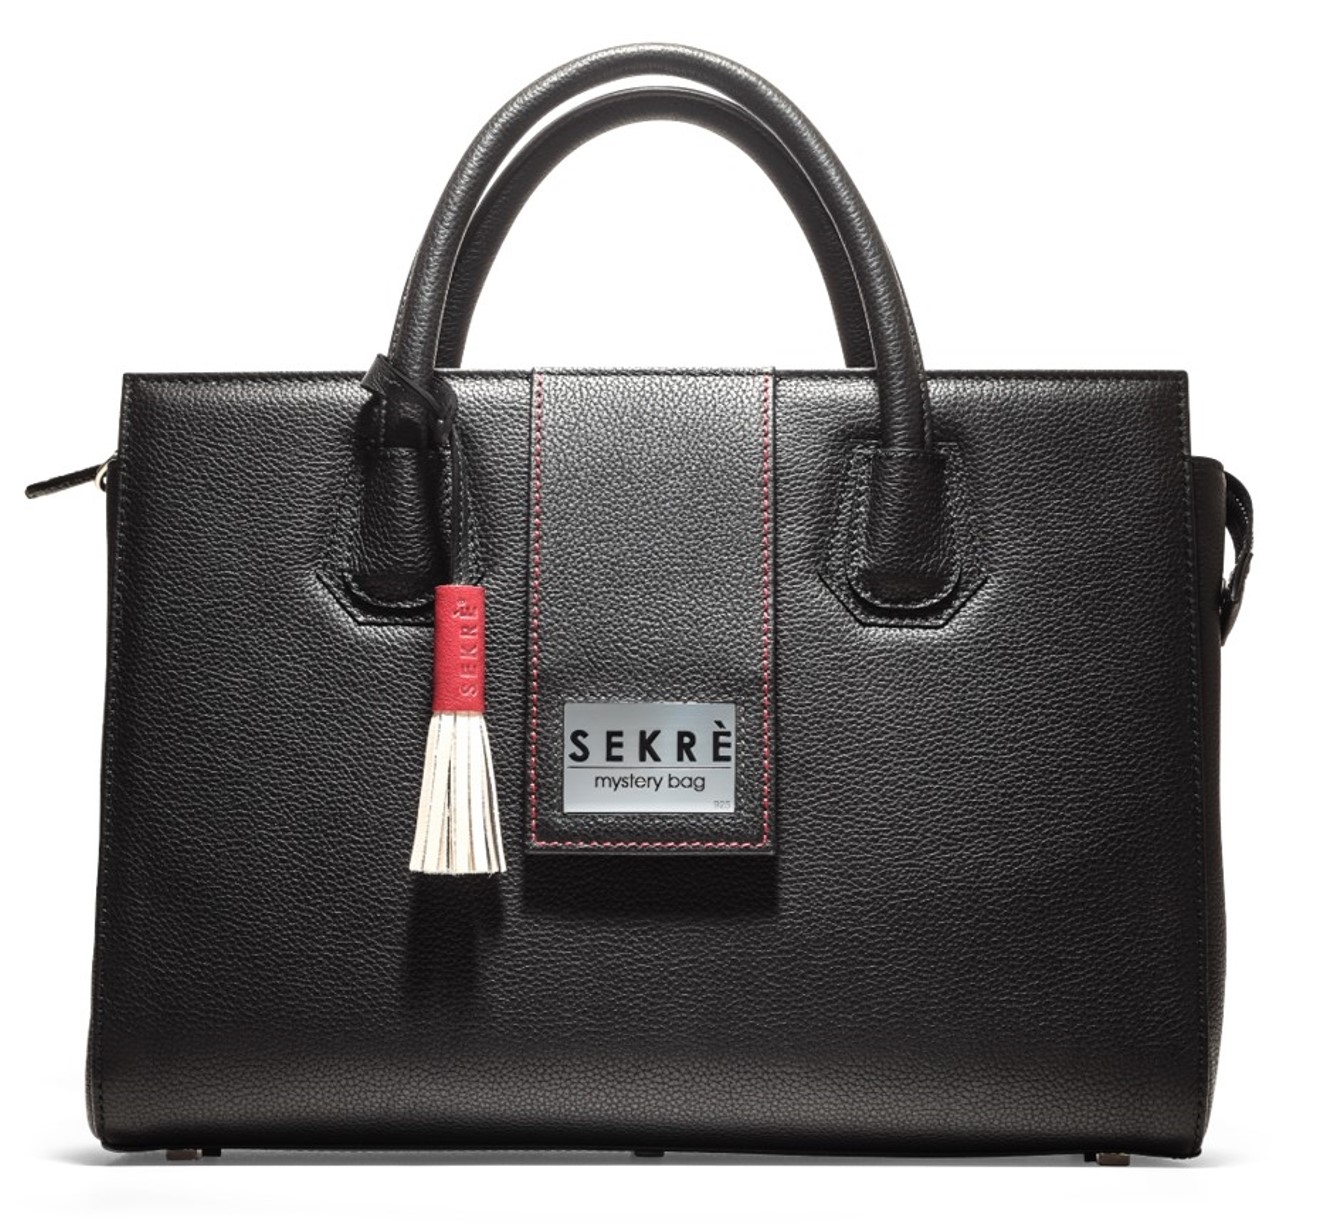 SEKRÈ - Mystery Bag